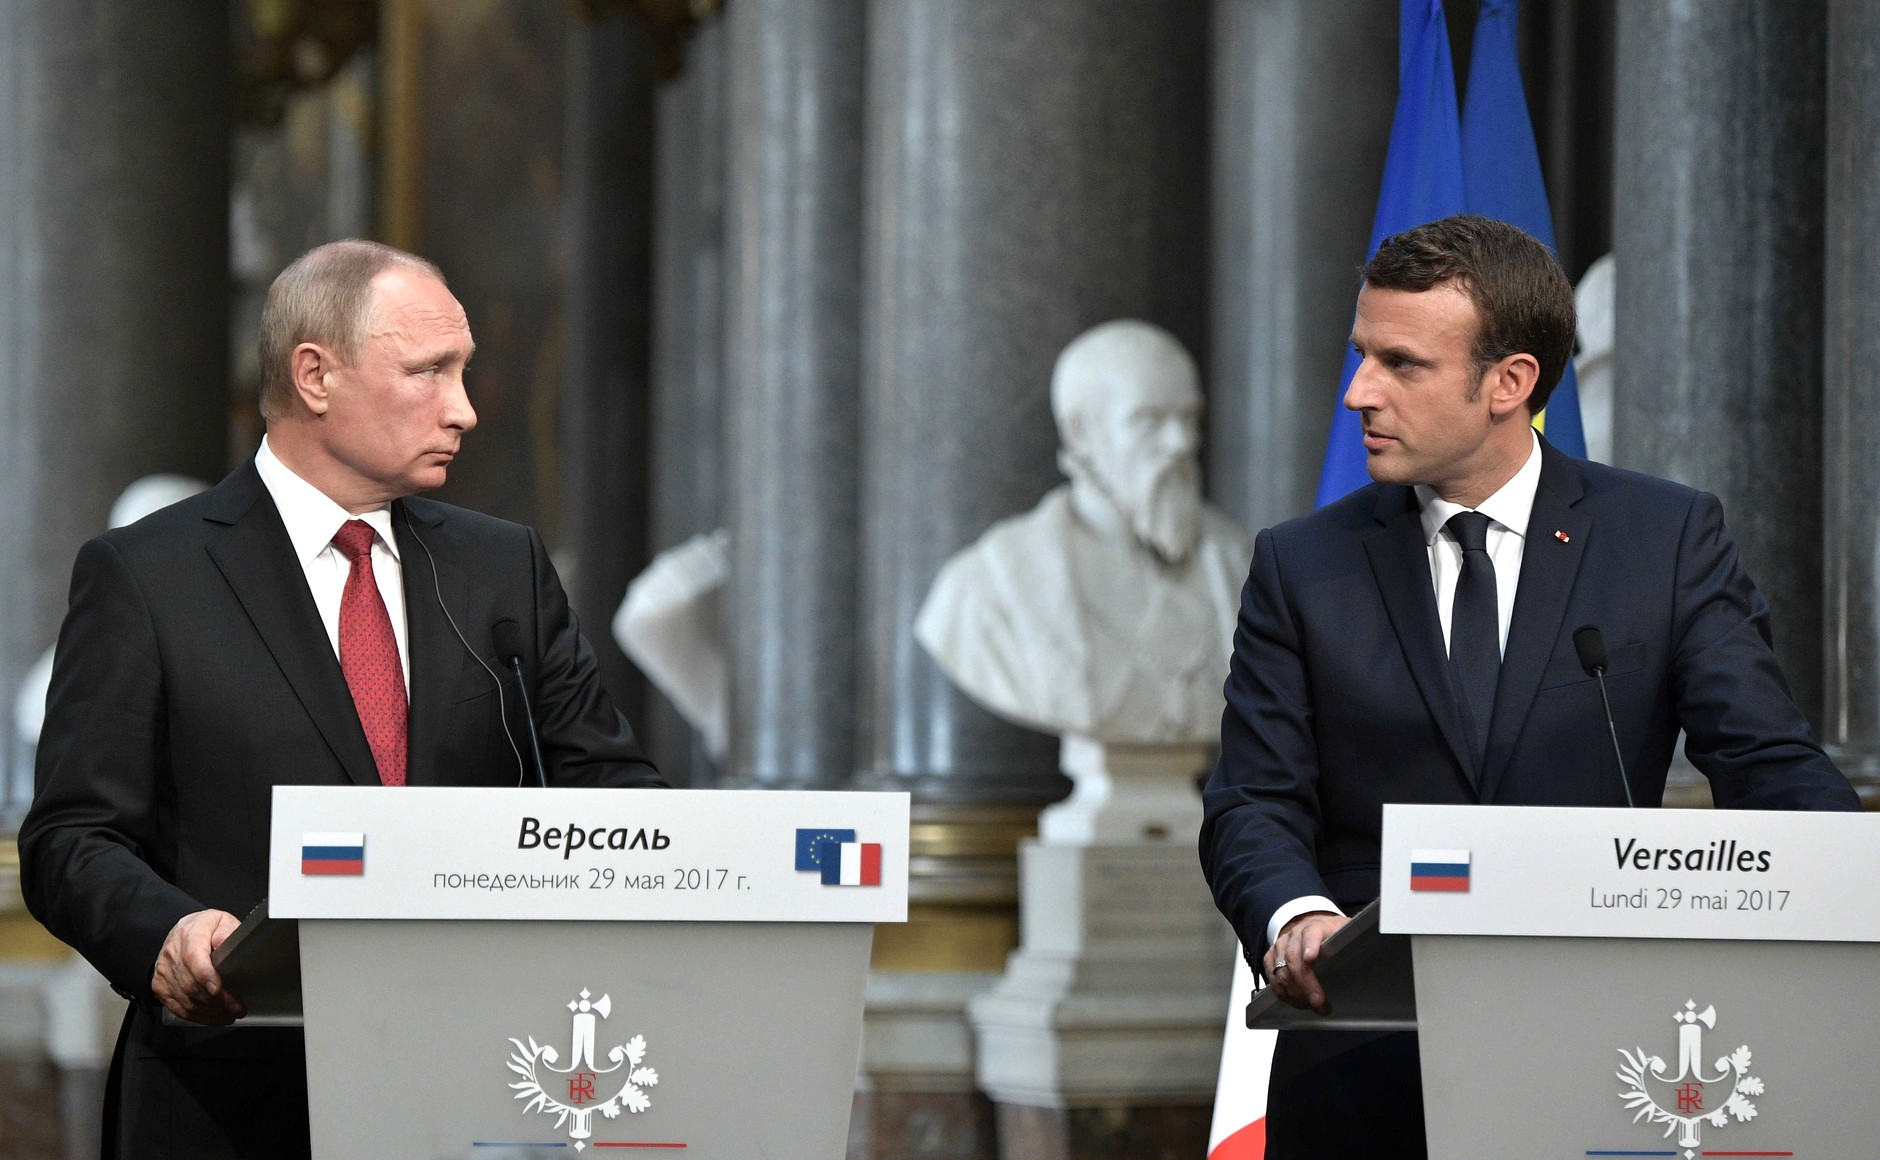 File:Vladimir Putin and Emmanuel Macron (2017-05-29) 14.jpg - Wikimedia Commons